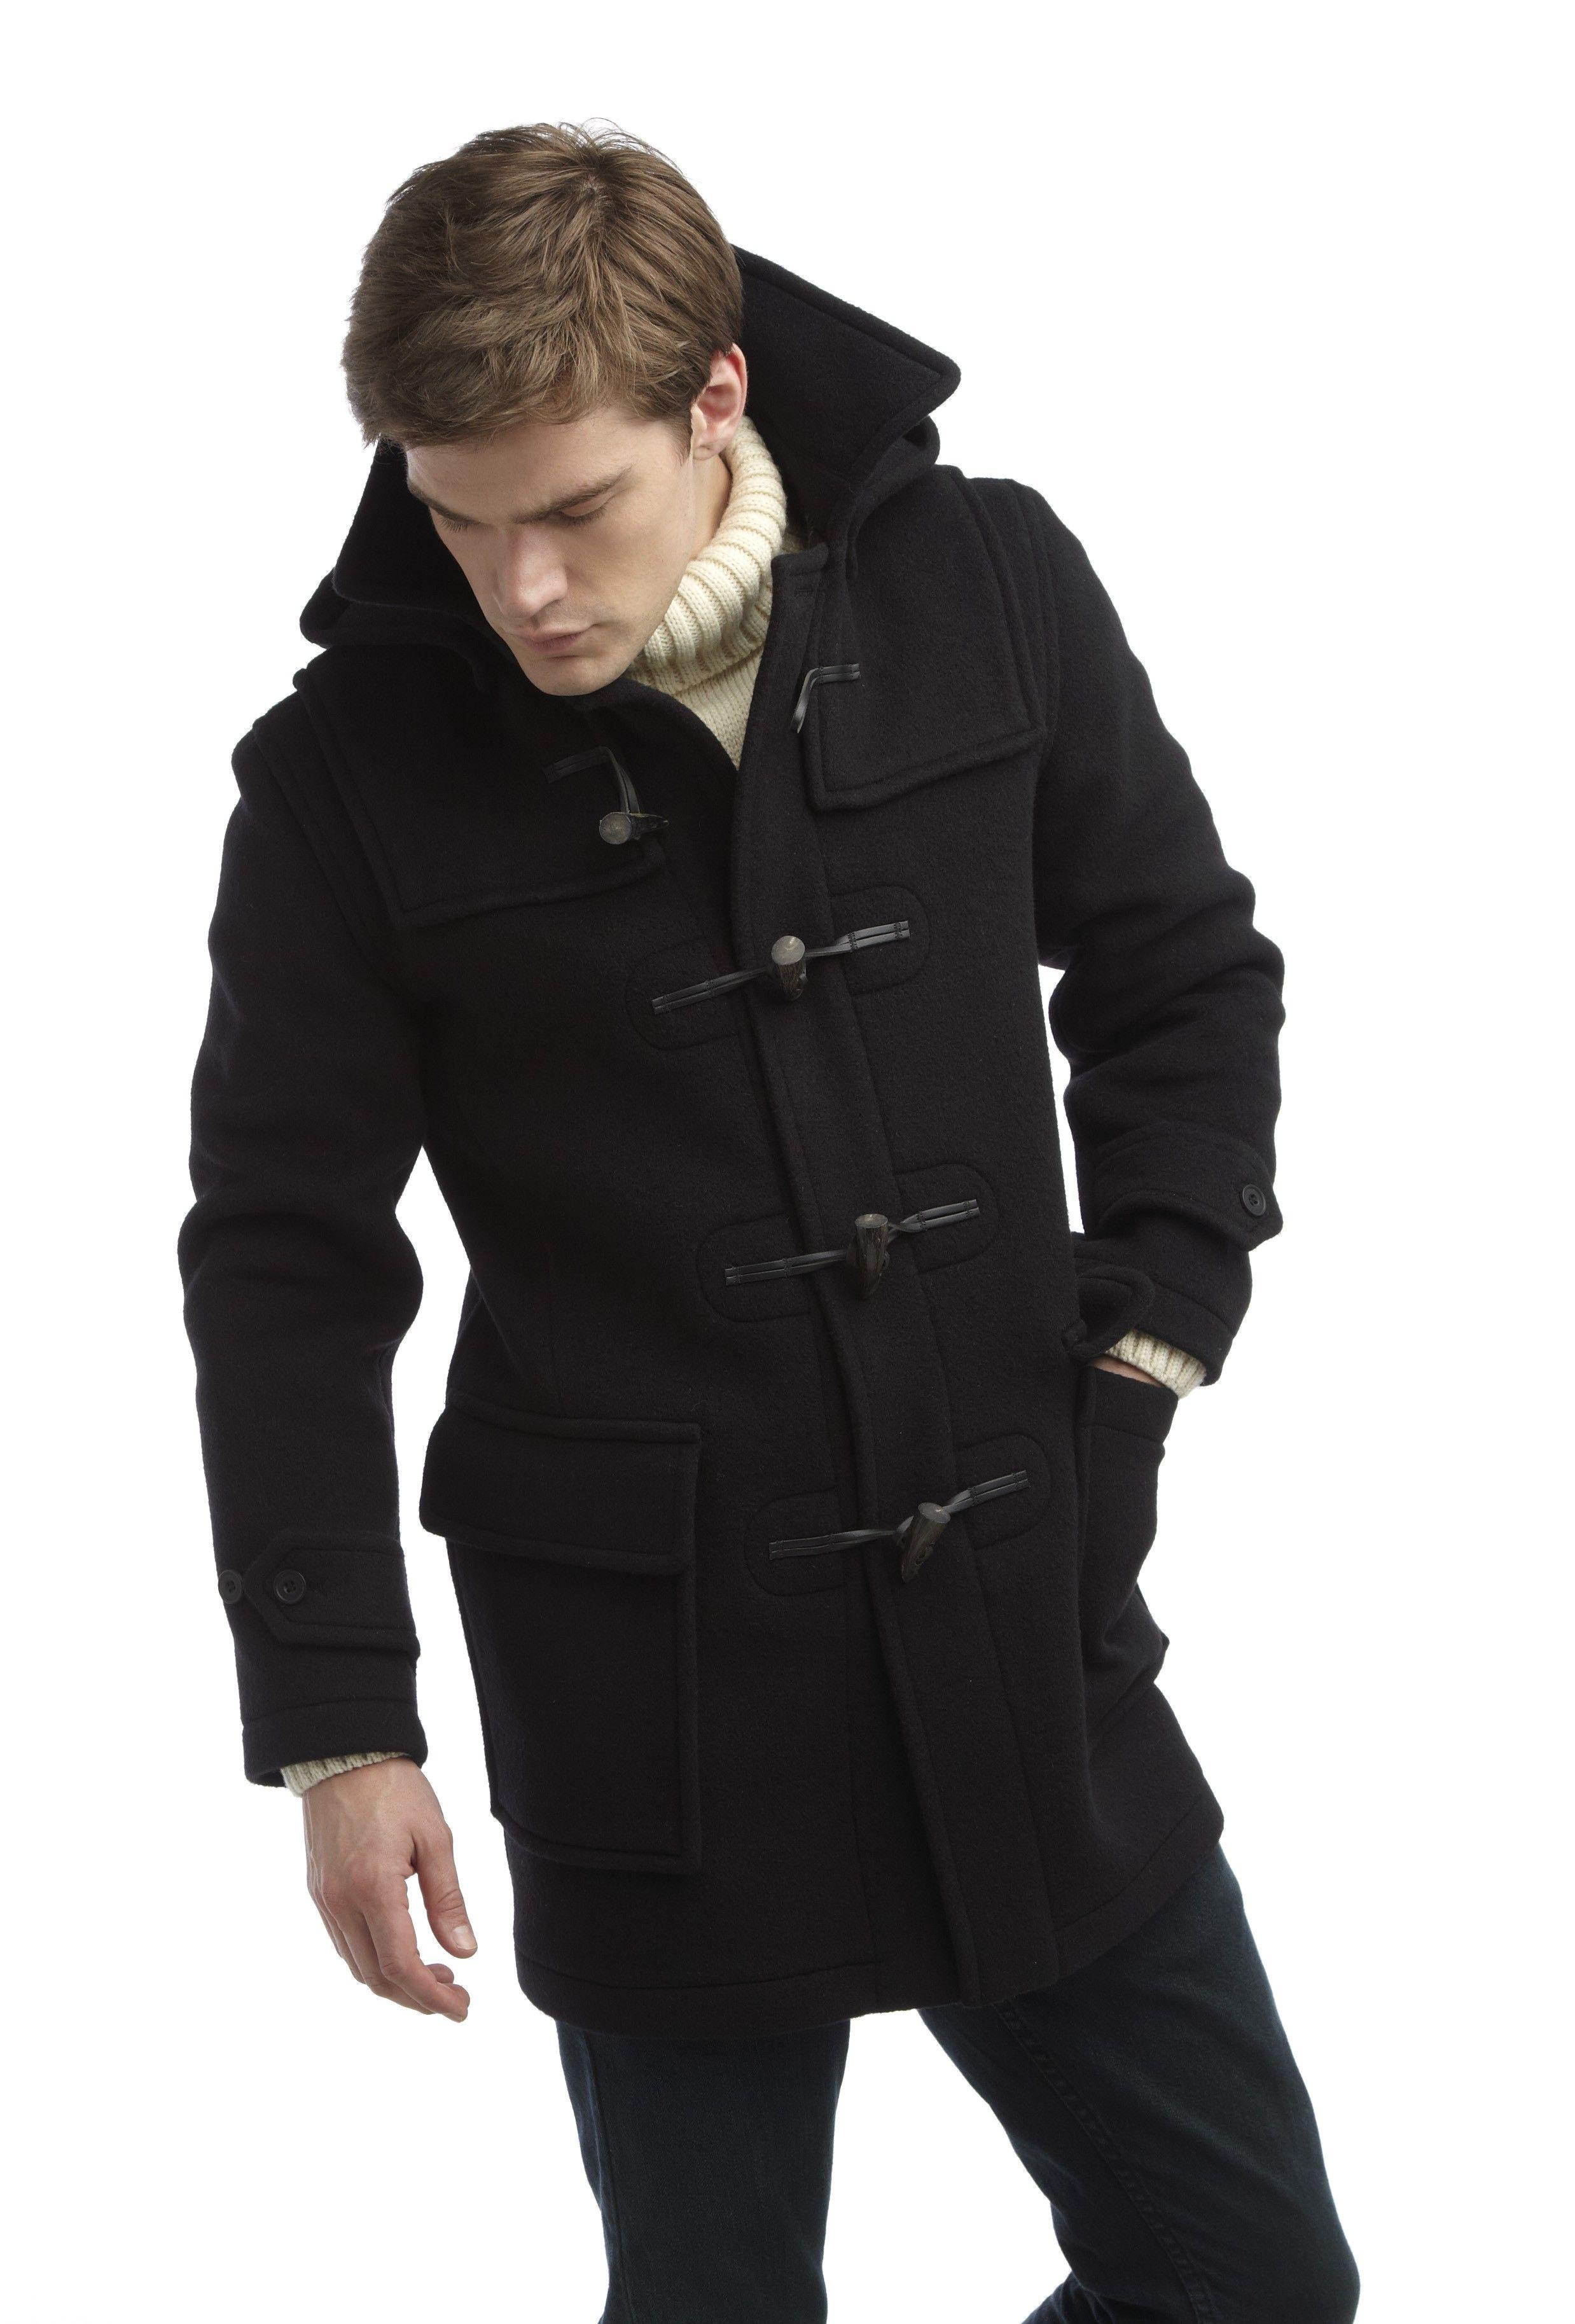 77af390730fb Mens London Duffle Coat -- Navy - Mens Classic Duffle Coat by Original  Montgomery Made in Britain